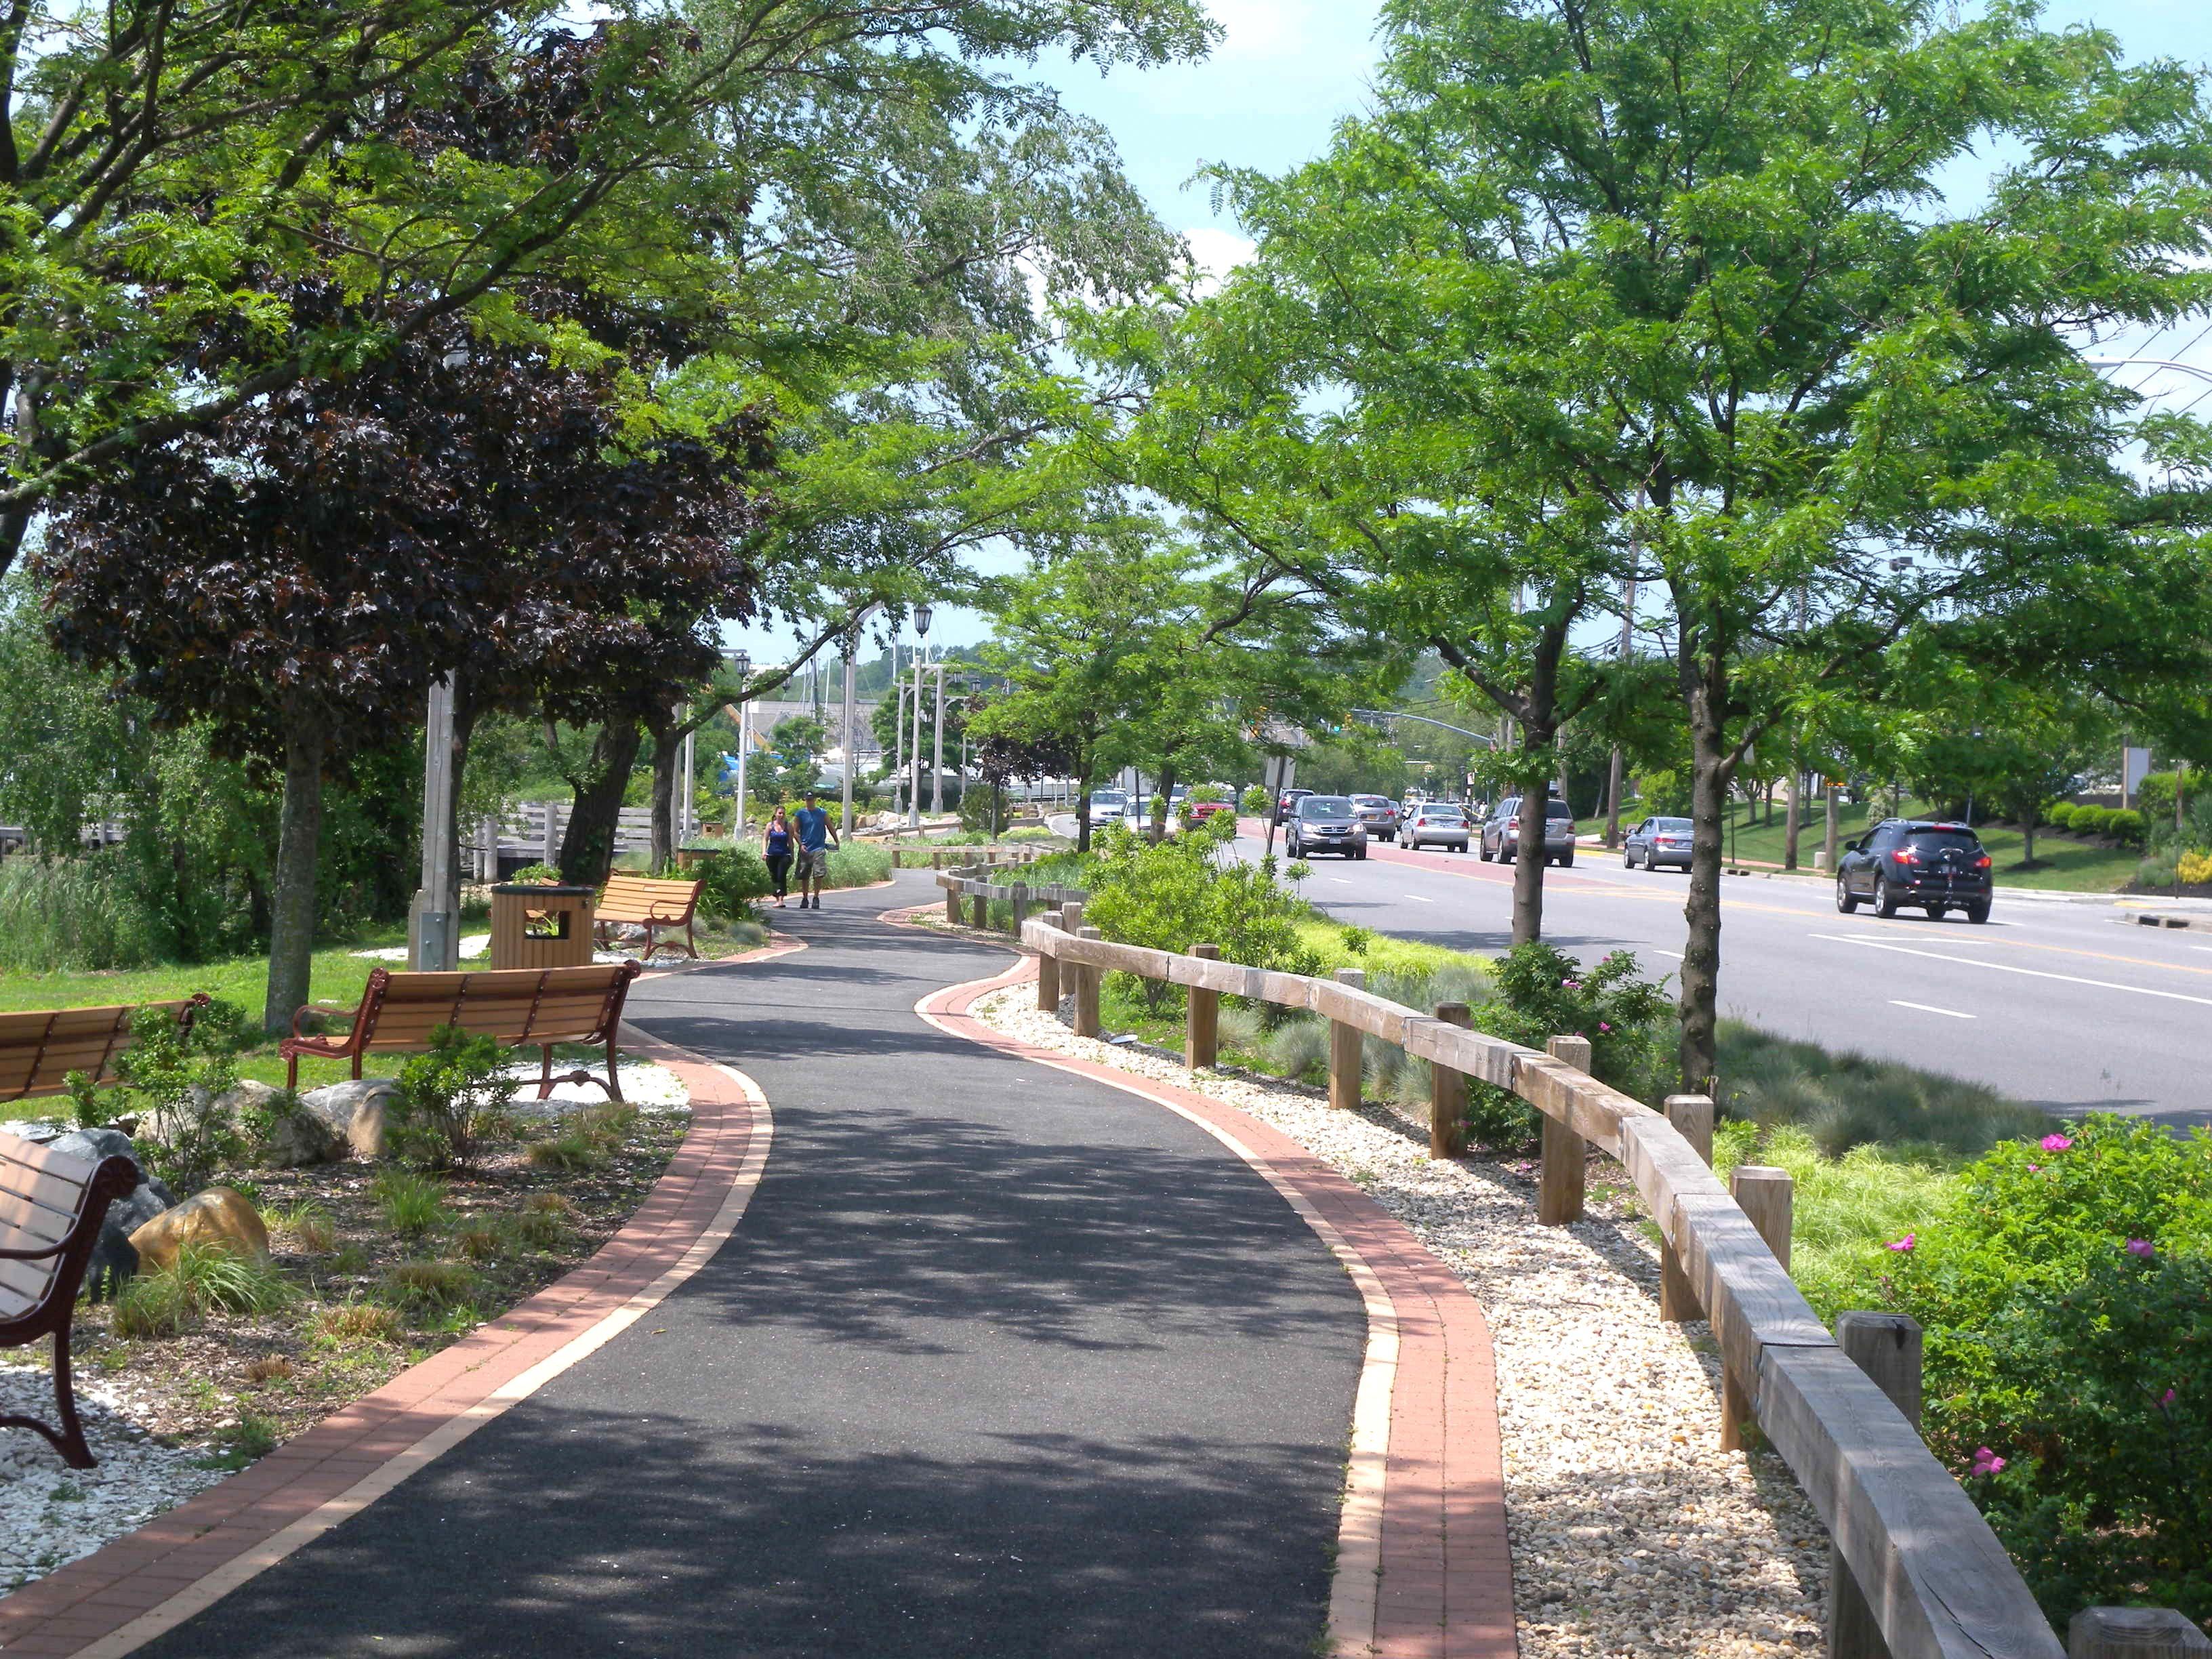 FileShore Rd Park Walkway Jeh